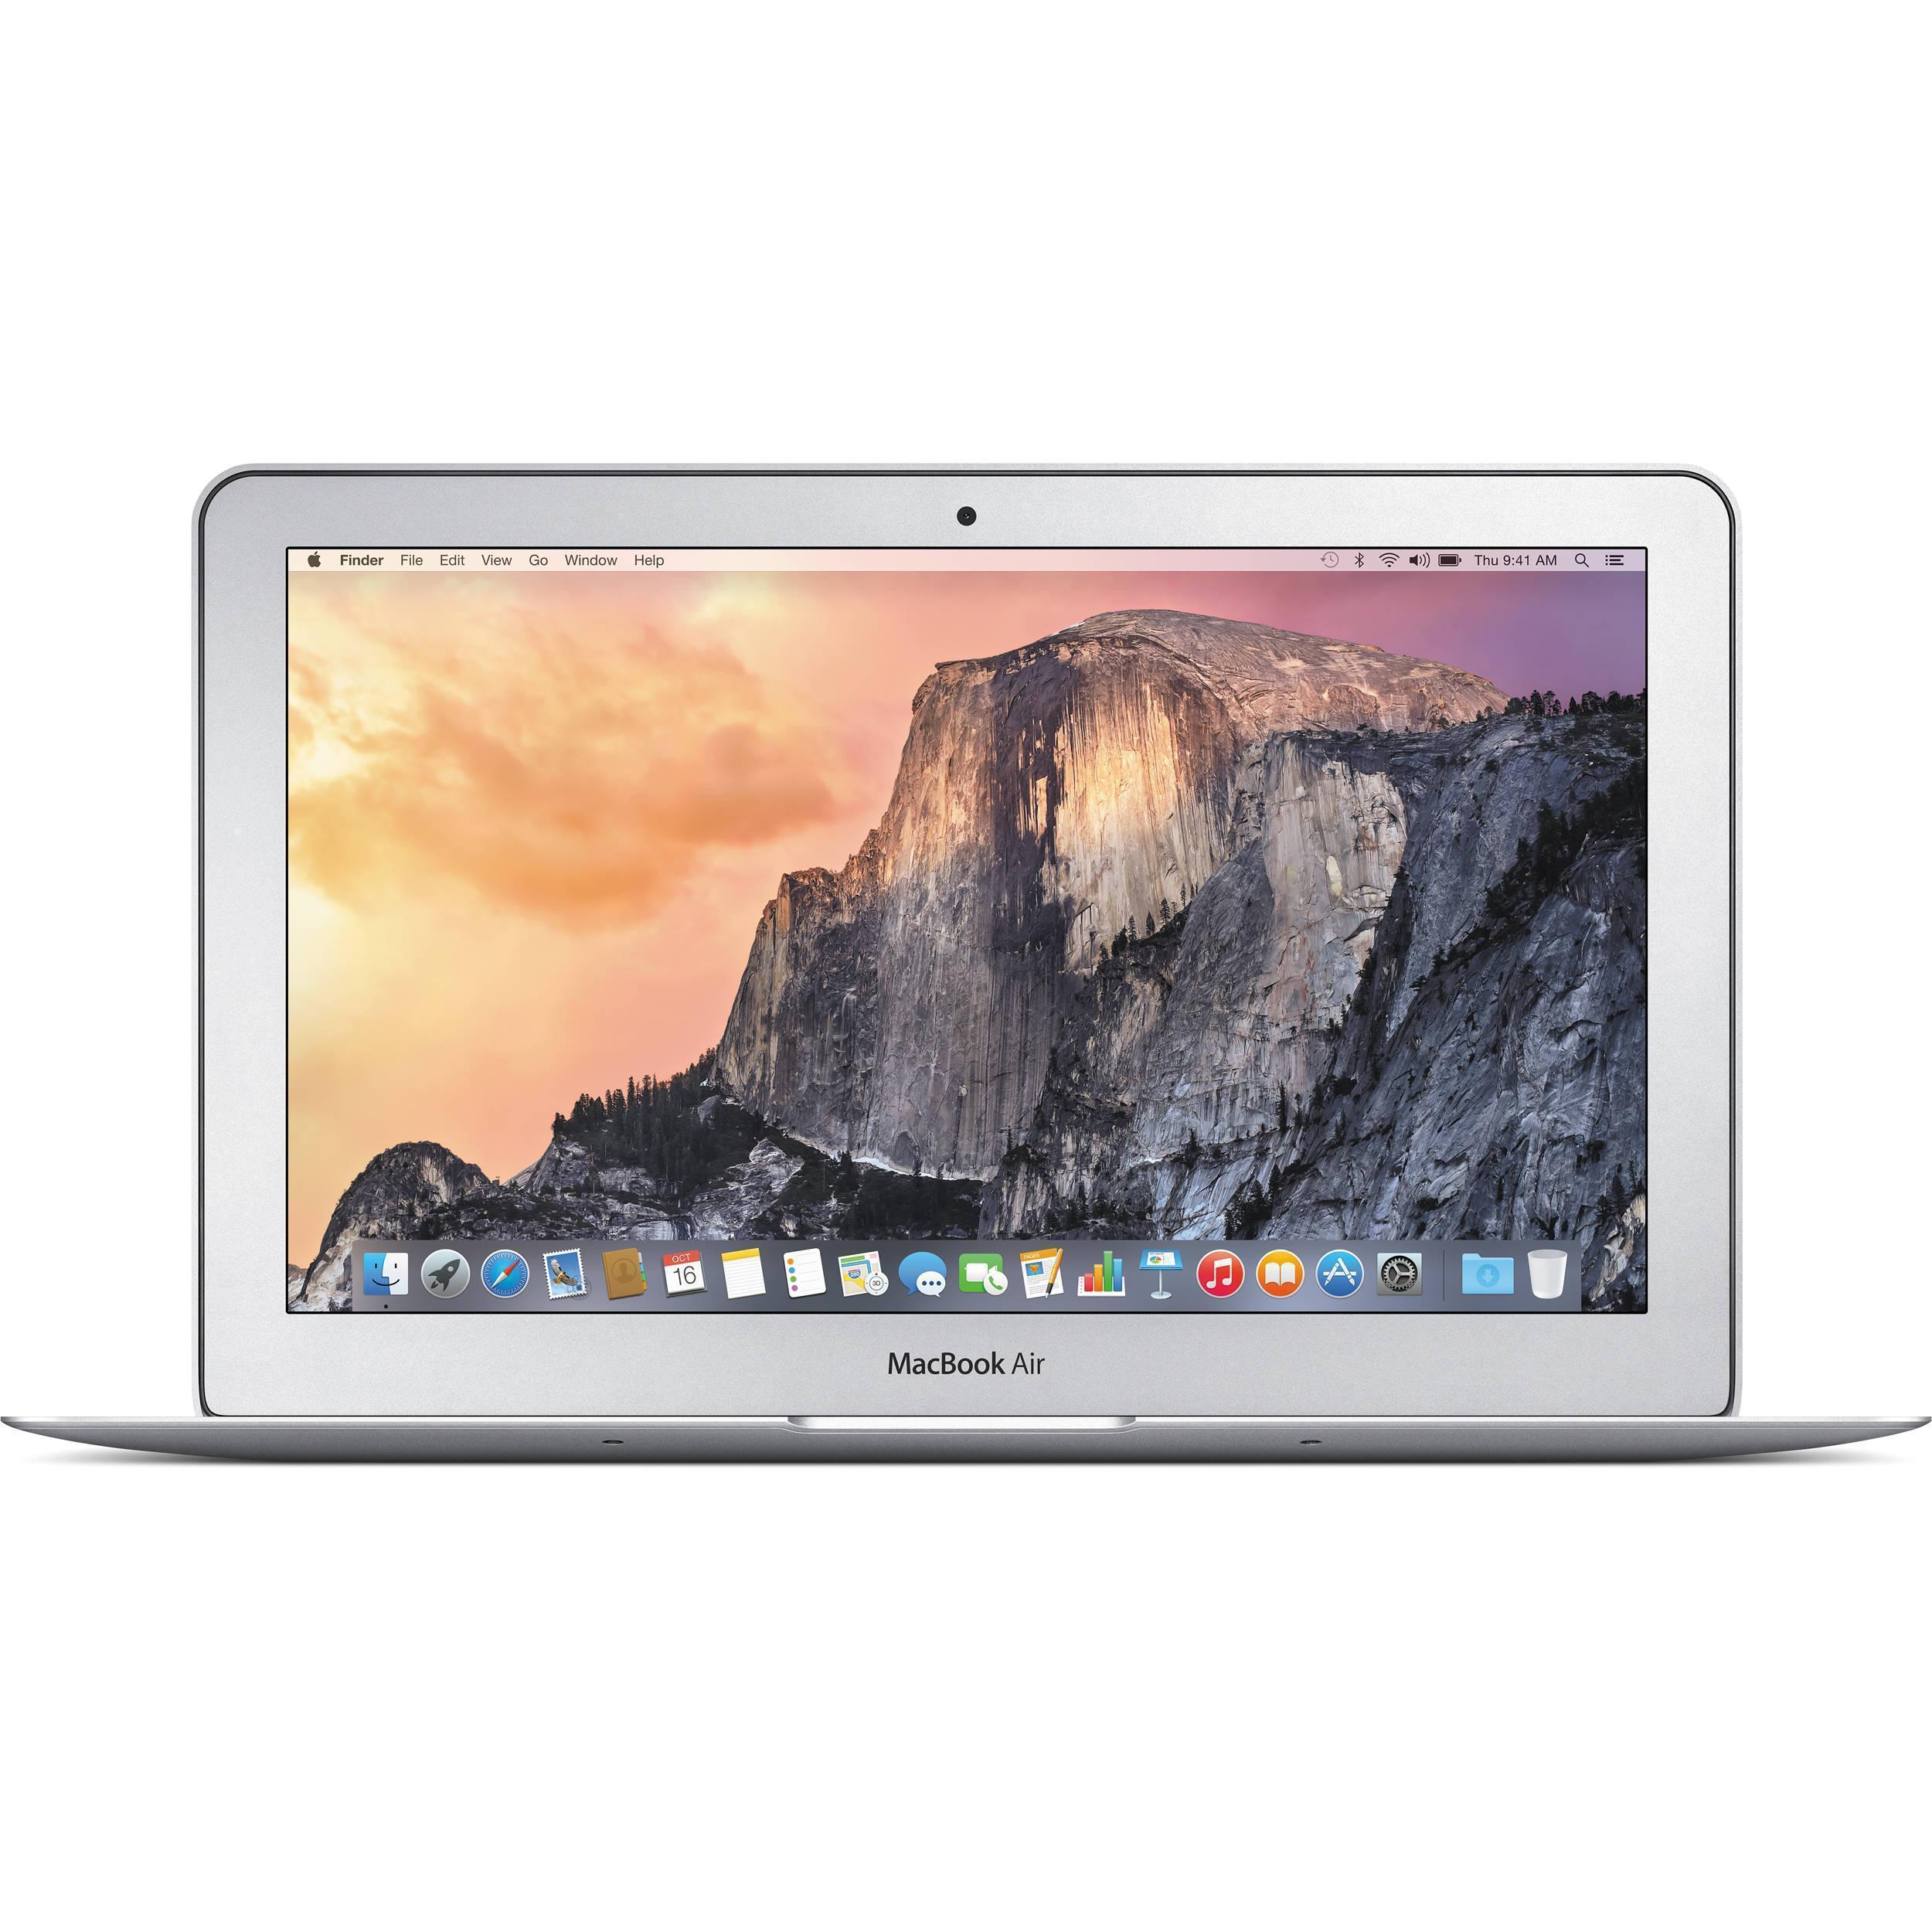 MacBook Air 11.6-inch (2013) - Core i5 - 4GB - SSD 261 GB QWERTY